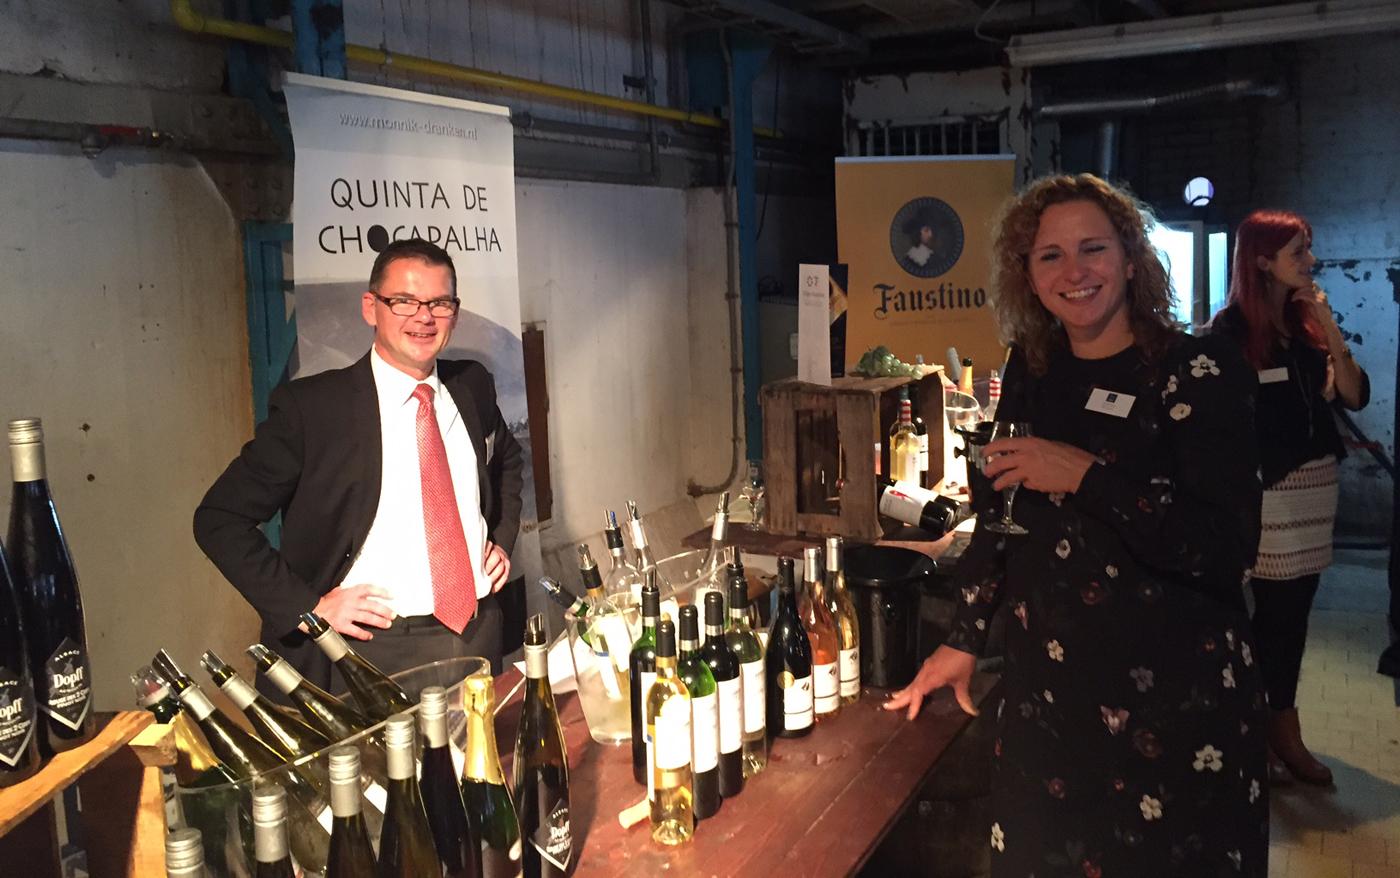 Mitra Ondernemersdag 2017 wijnstand Portugees wijnhuis Quinta de Chocapalha